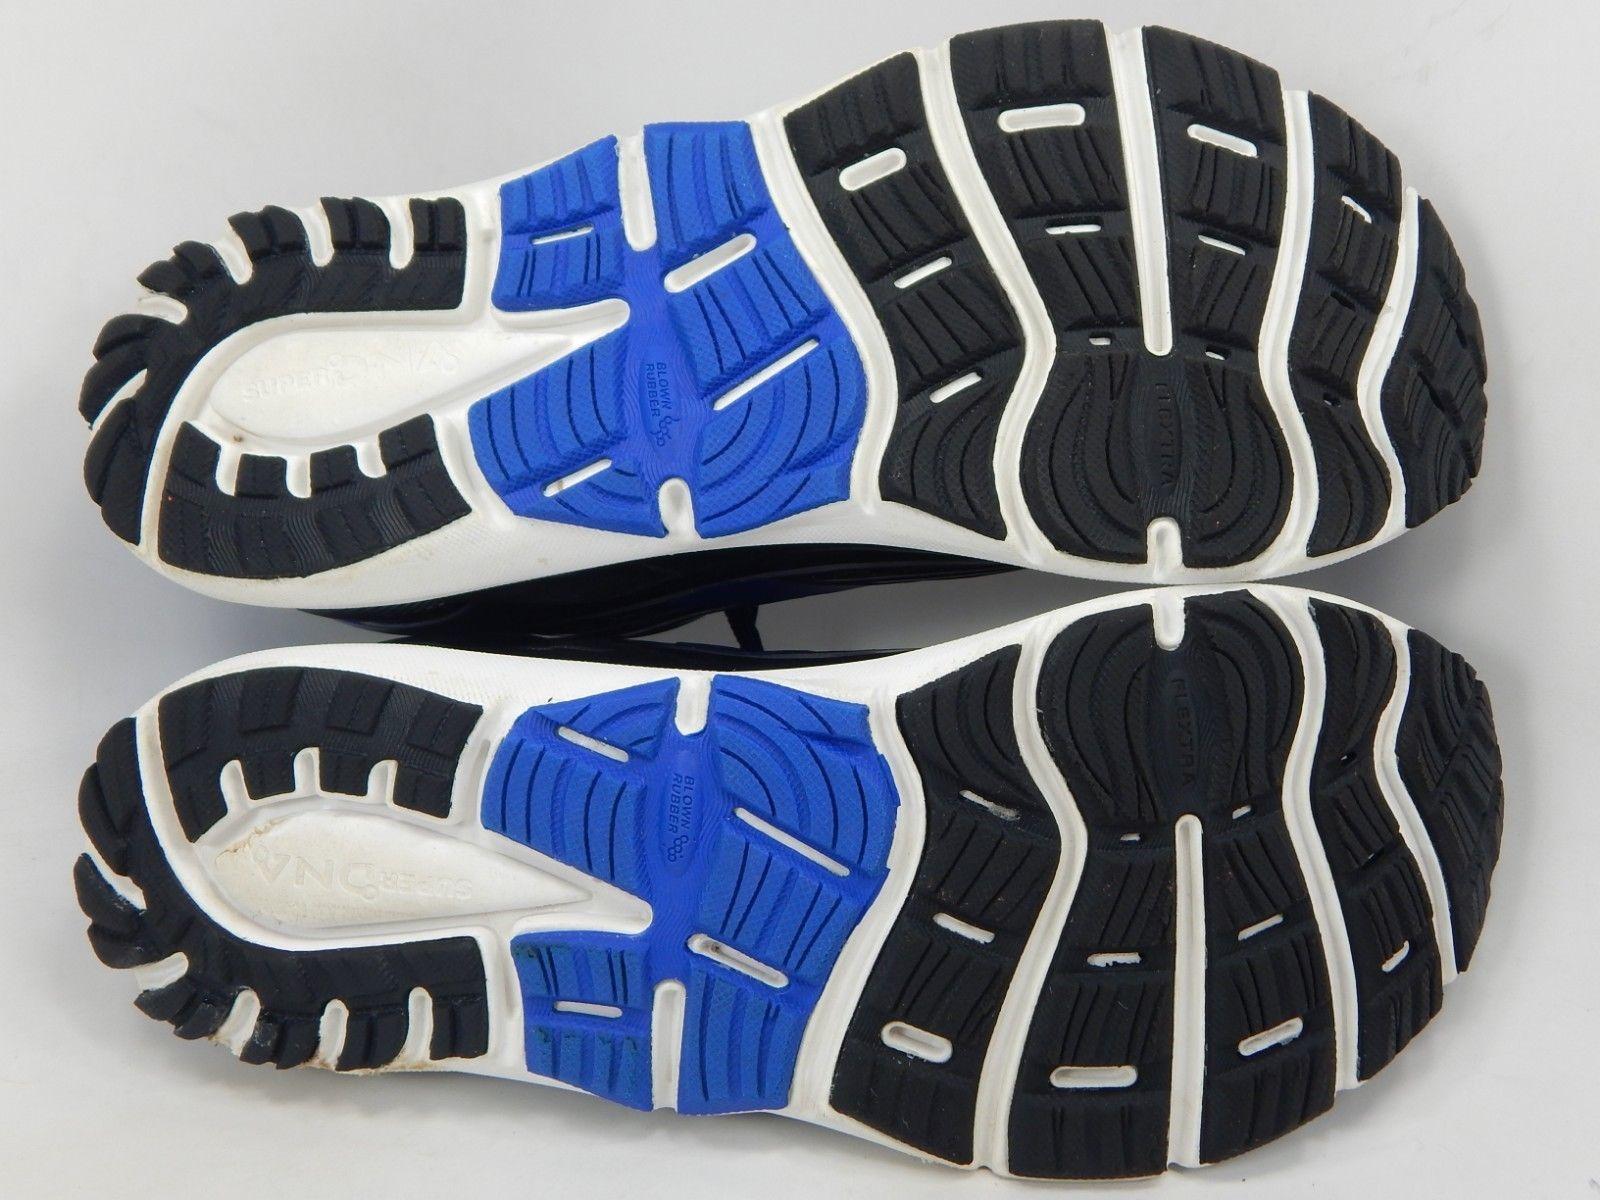 Brooks Transcend 4 Size US 10 M (D) EU 44 Men's Running Shoes Black 1102491D002 image 6